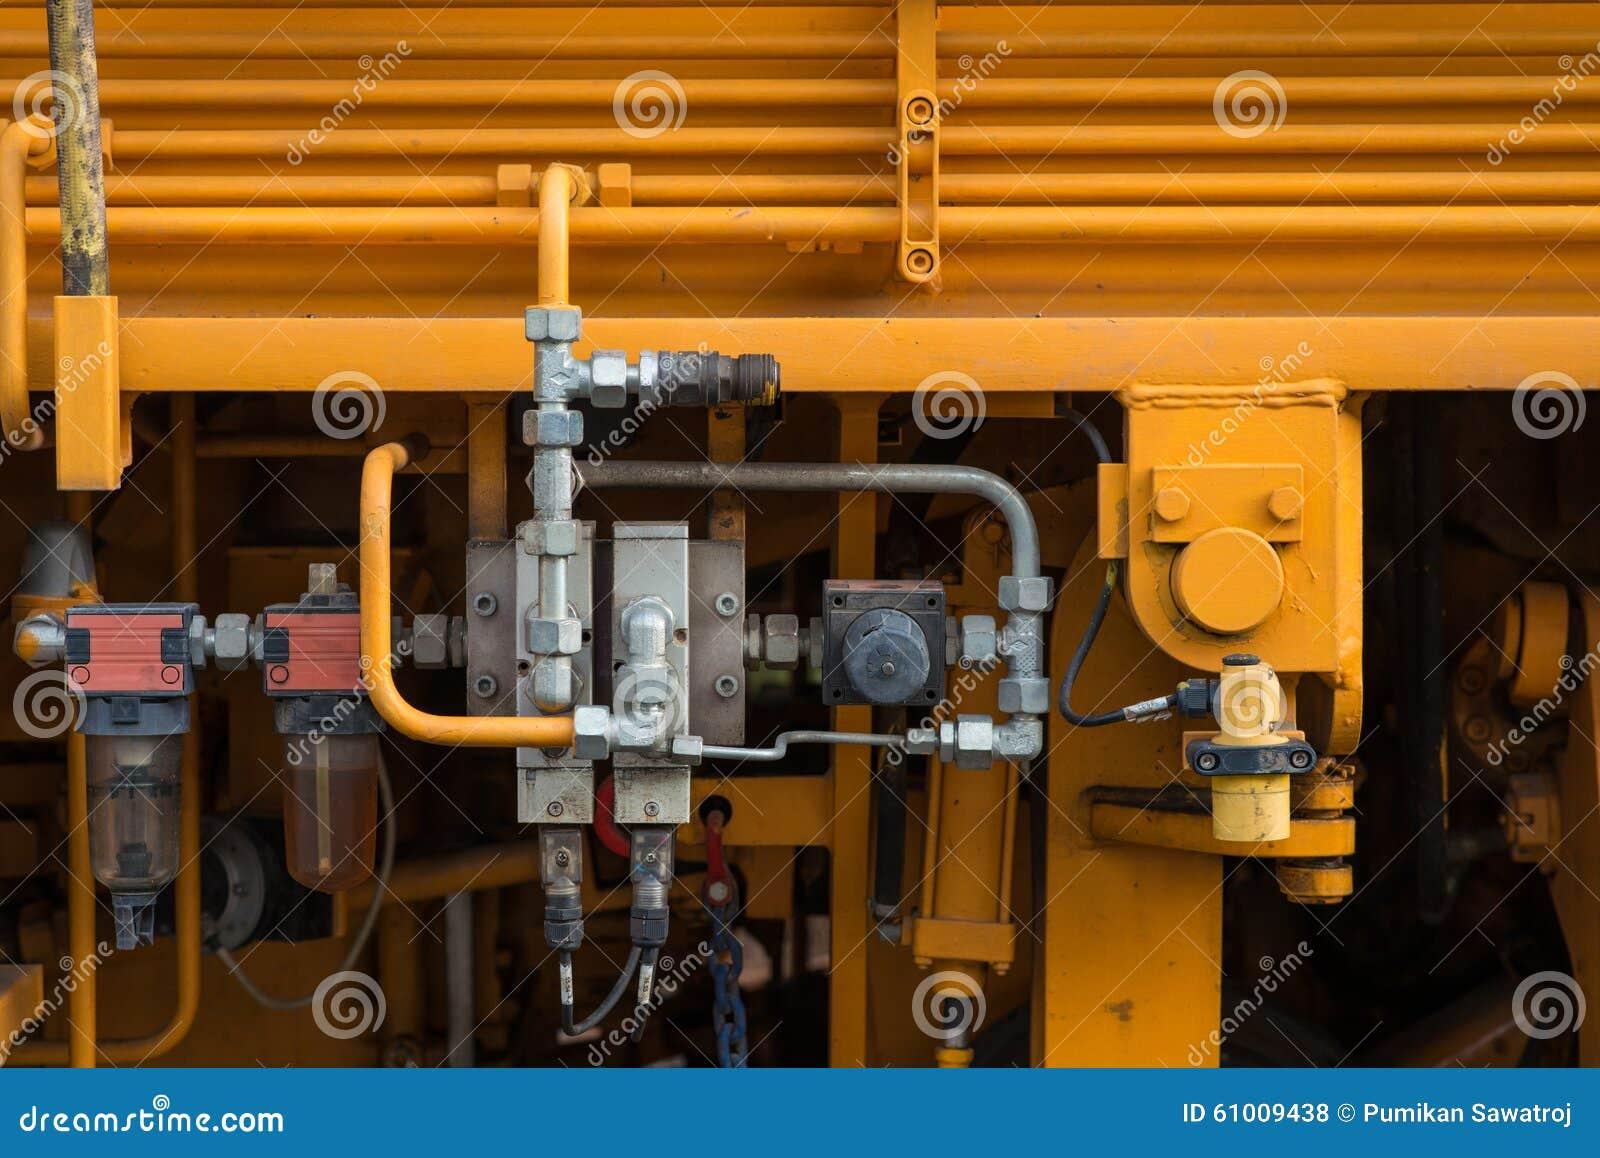 Tubos, encaixes e alavancas hidráulicos no painel de controle do levantamento